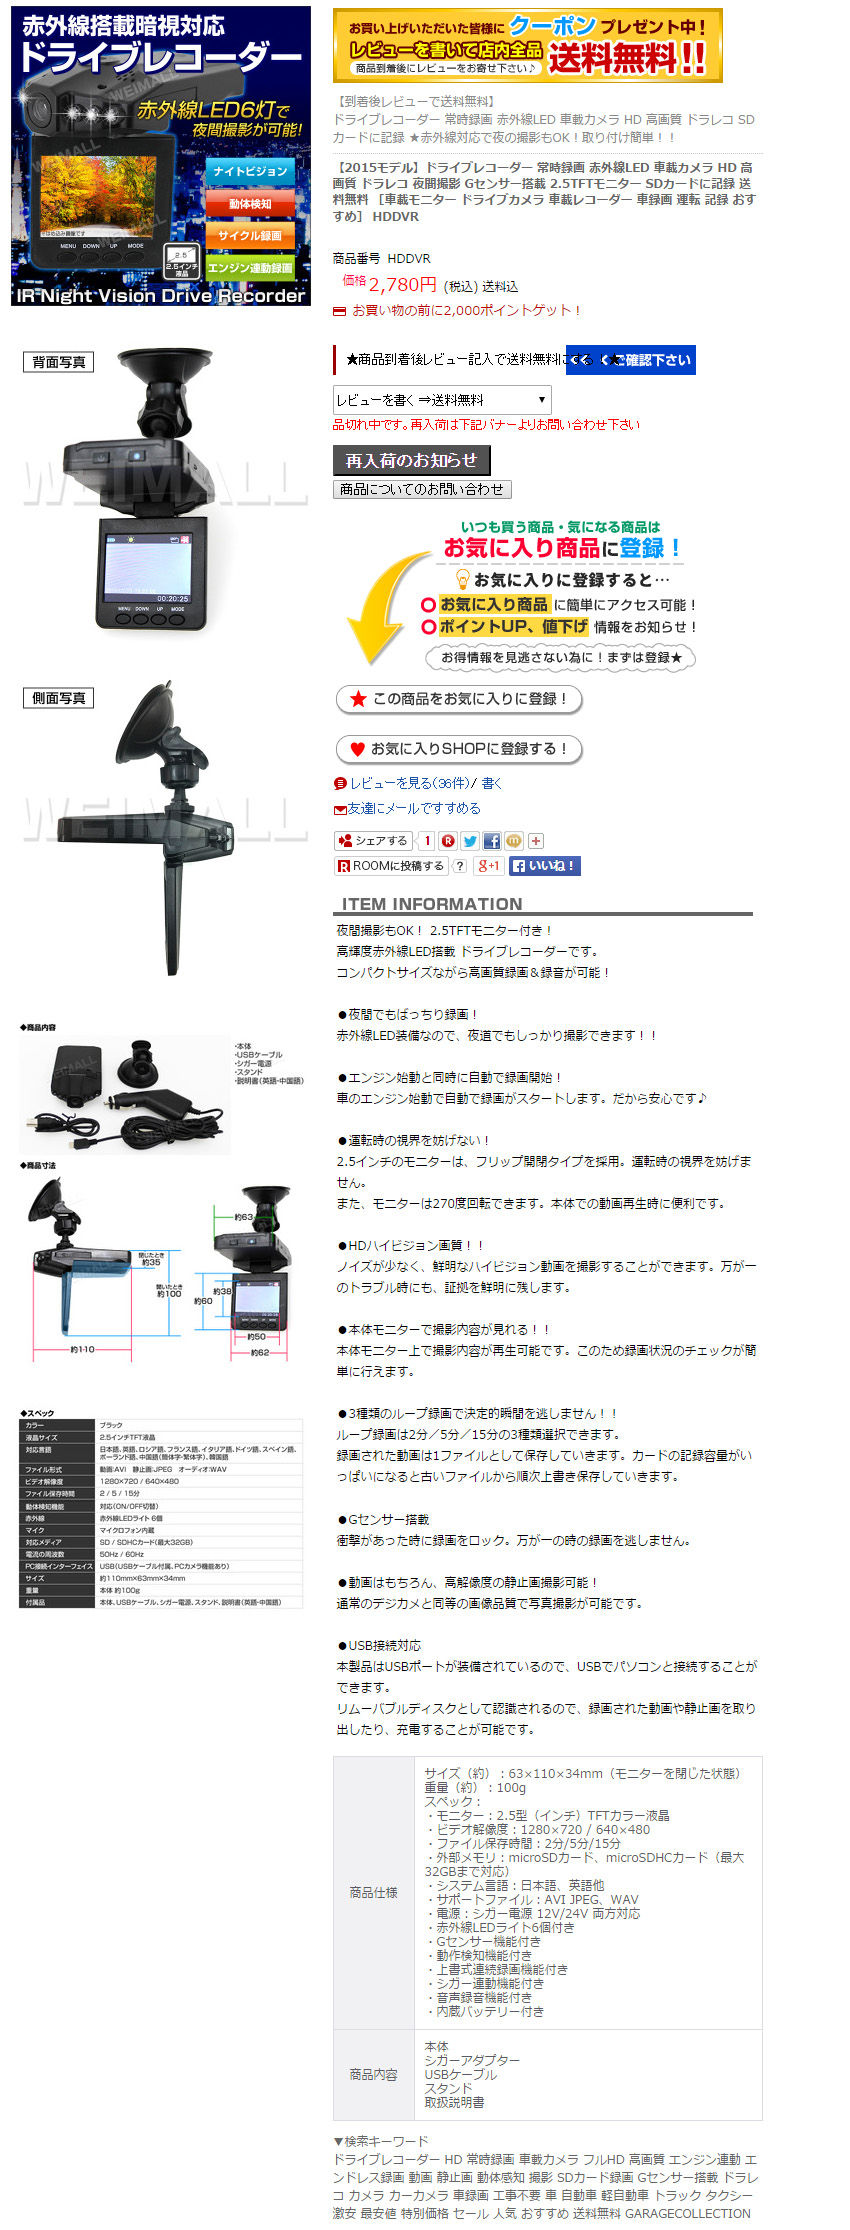 HDDVR01